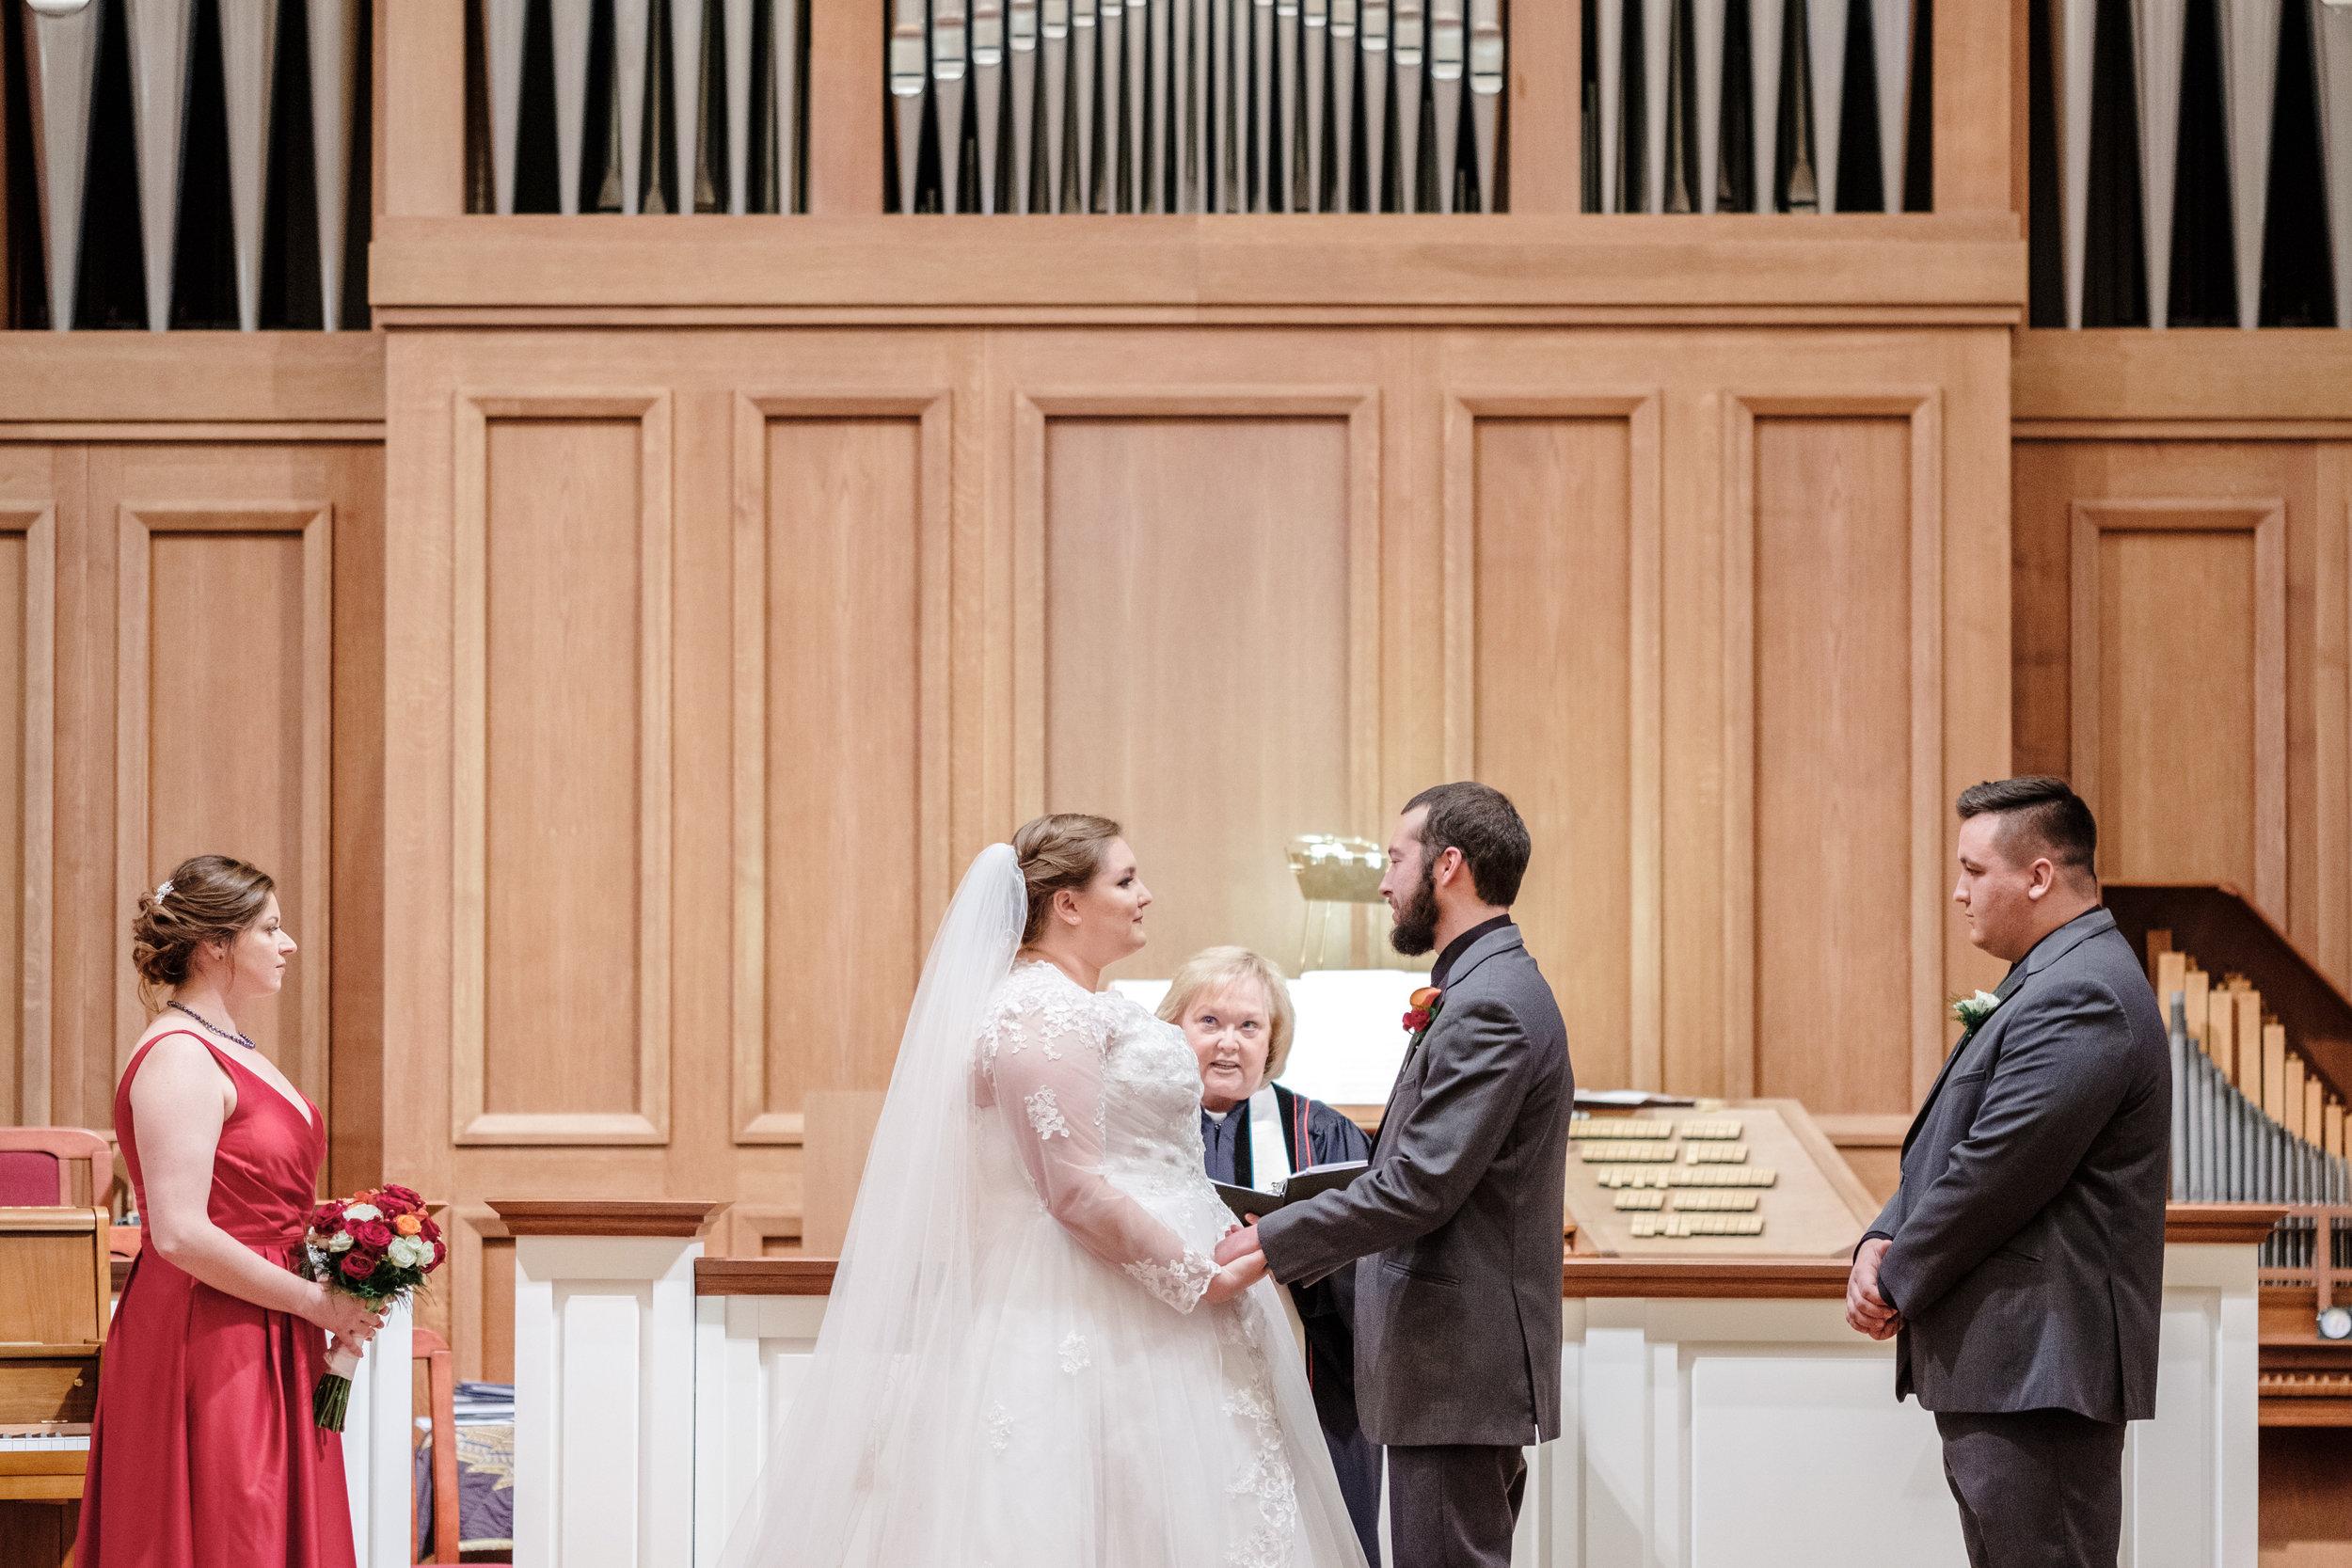 18-12-28 Corinne-Henry-Pavilion-Wedding-292.jpg